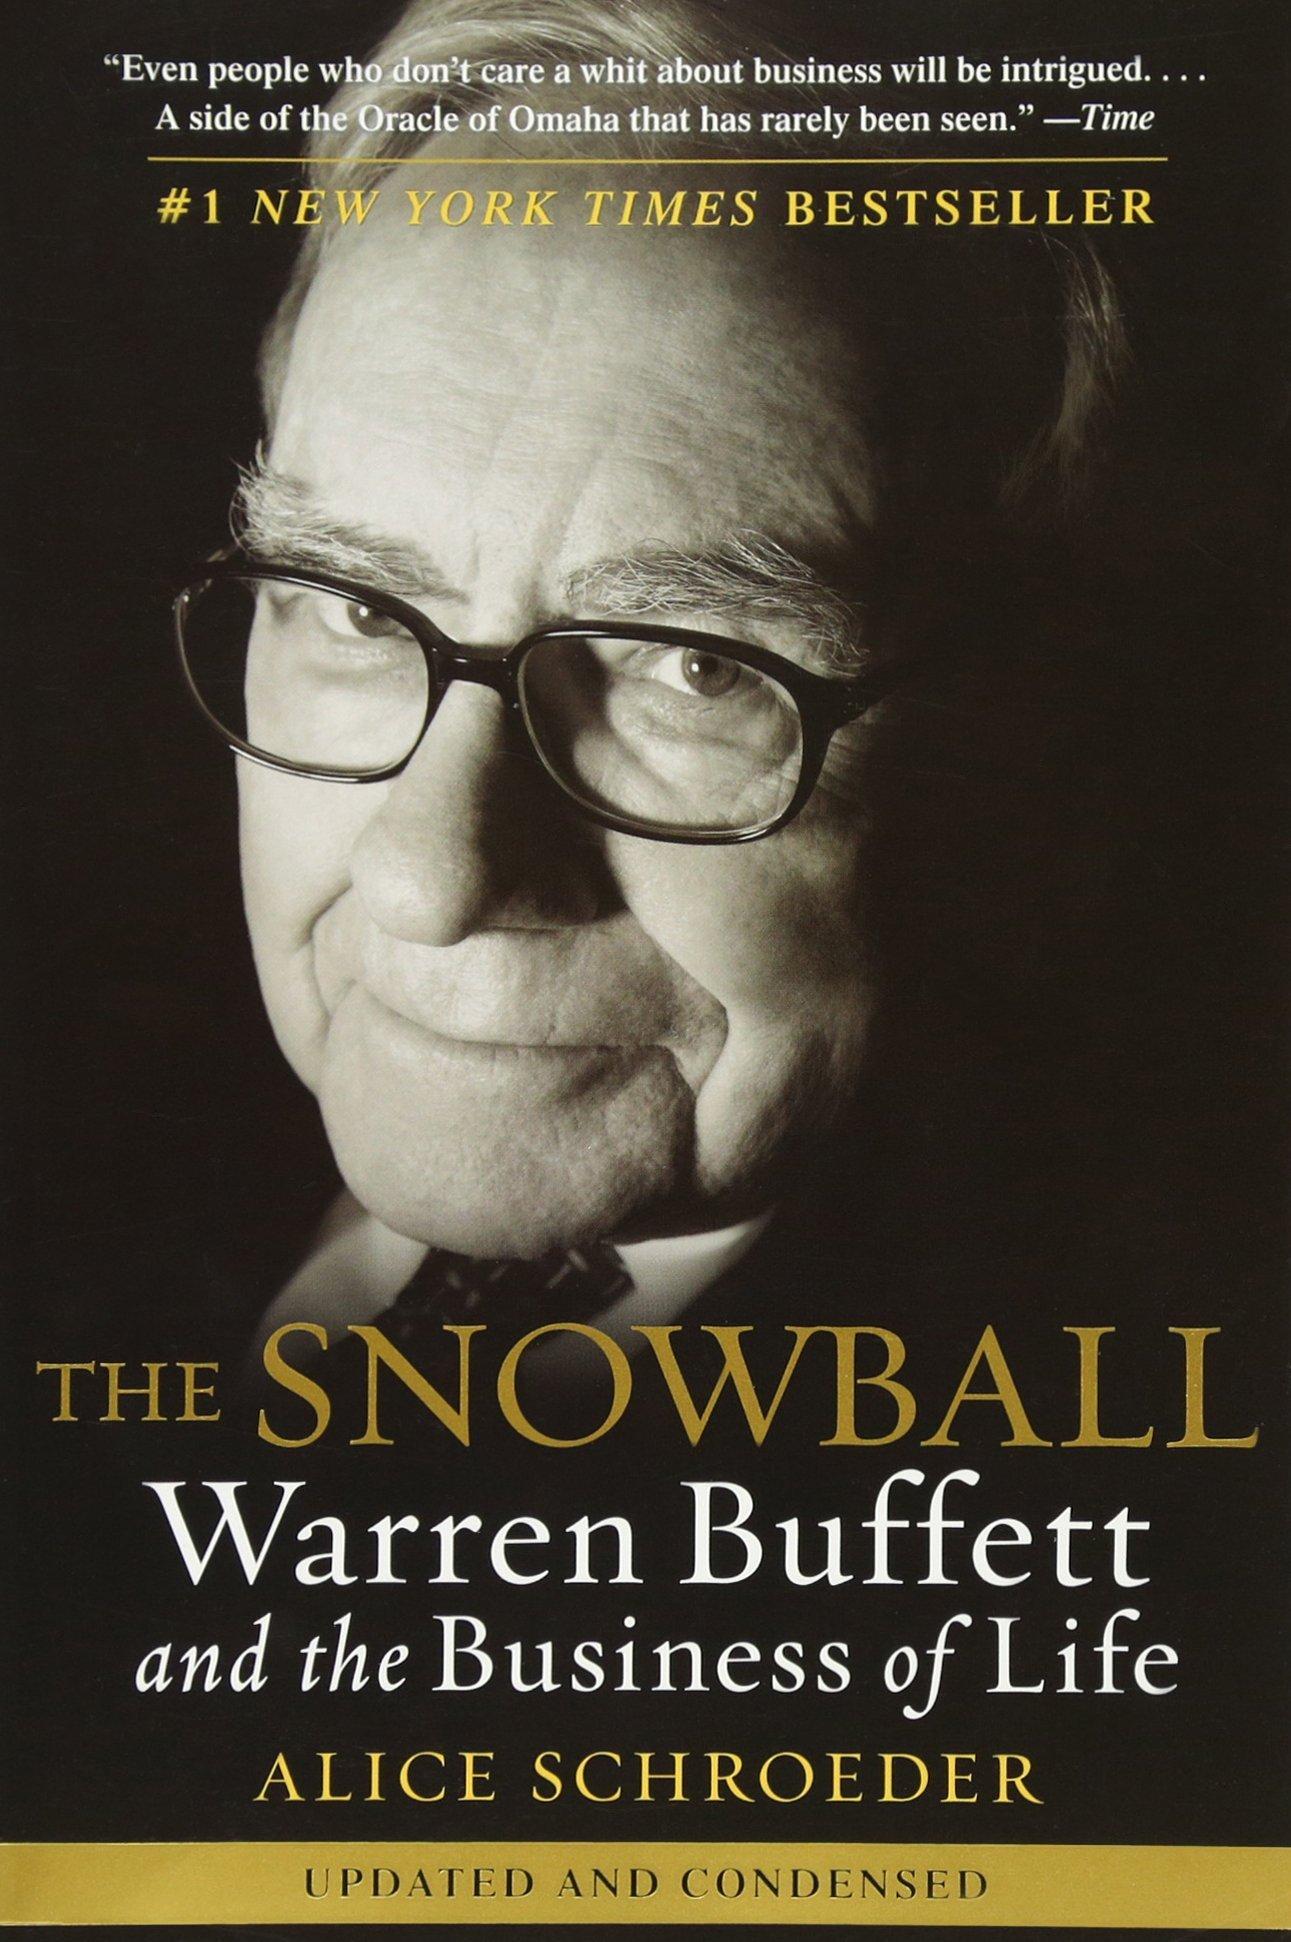 Billionaire Warren Buffett Predicts New Pandemic Worse Than COVID-19